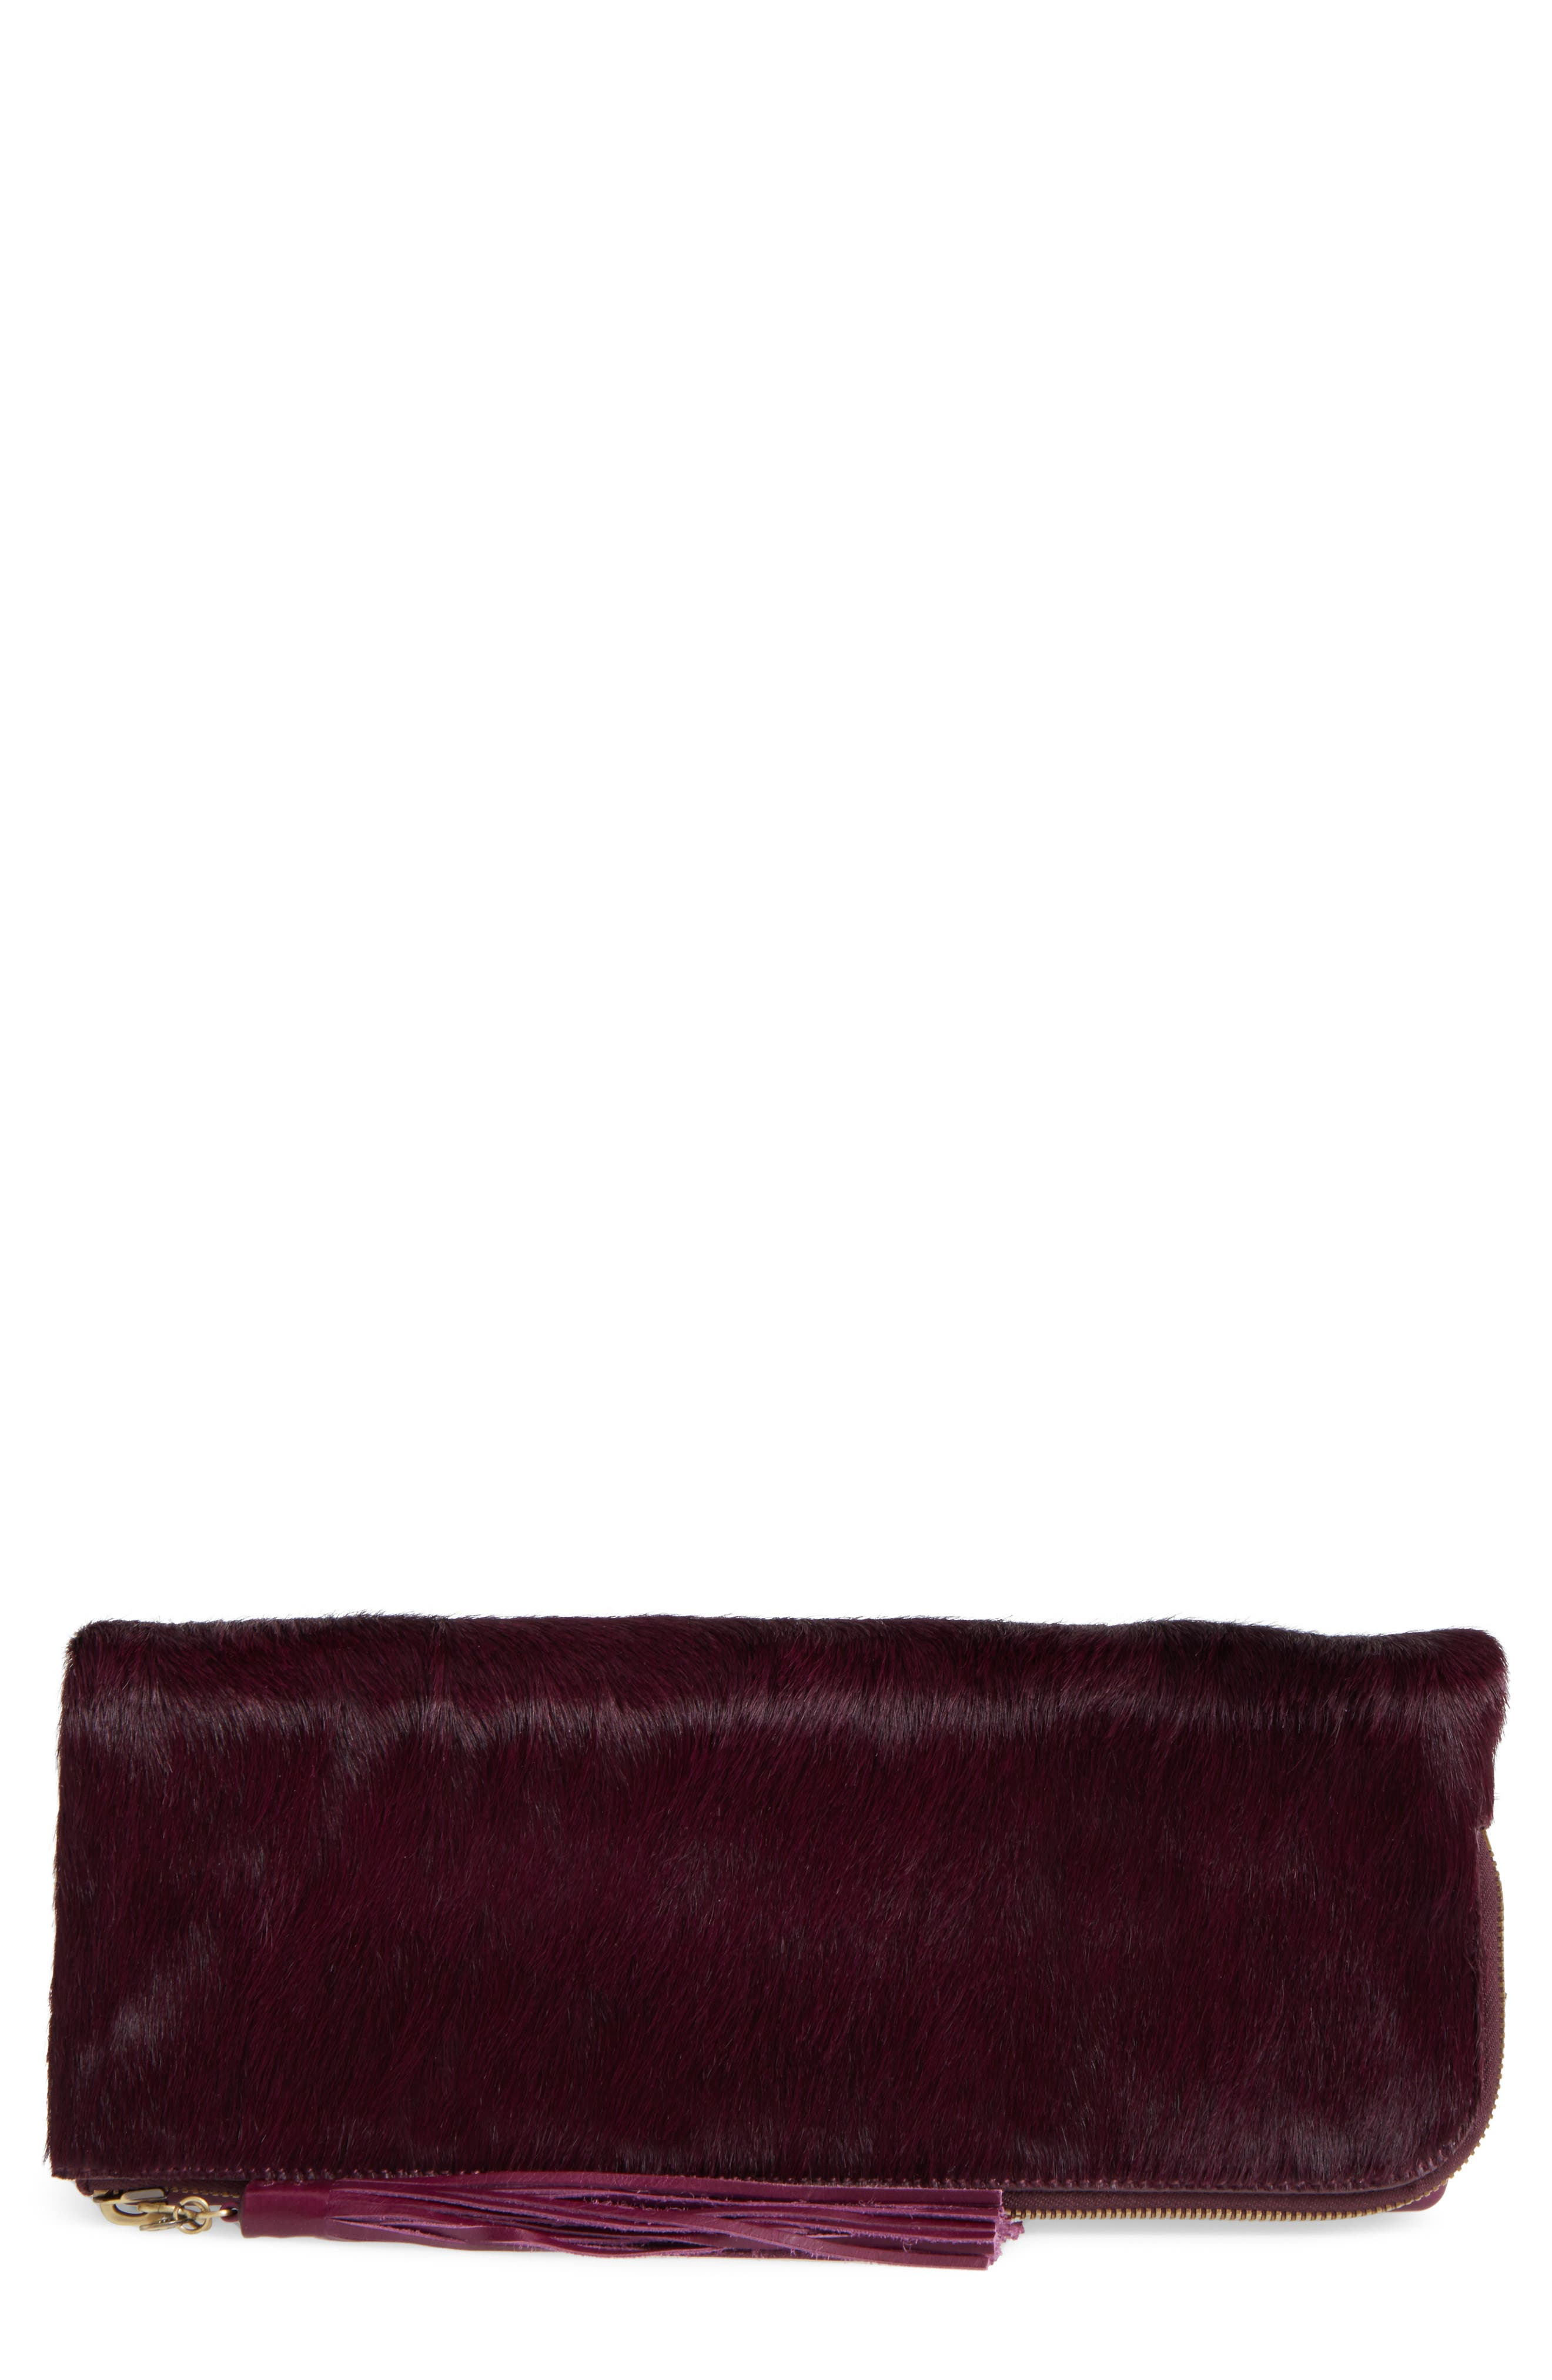 Hobo Raine Leather & Genuine Calf Hair Clutch